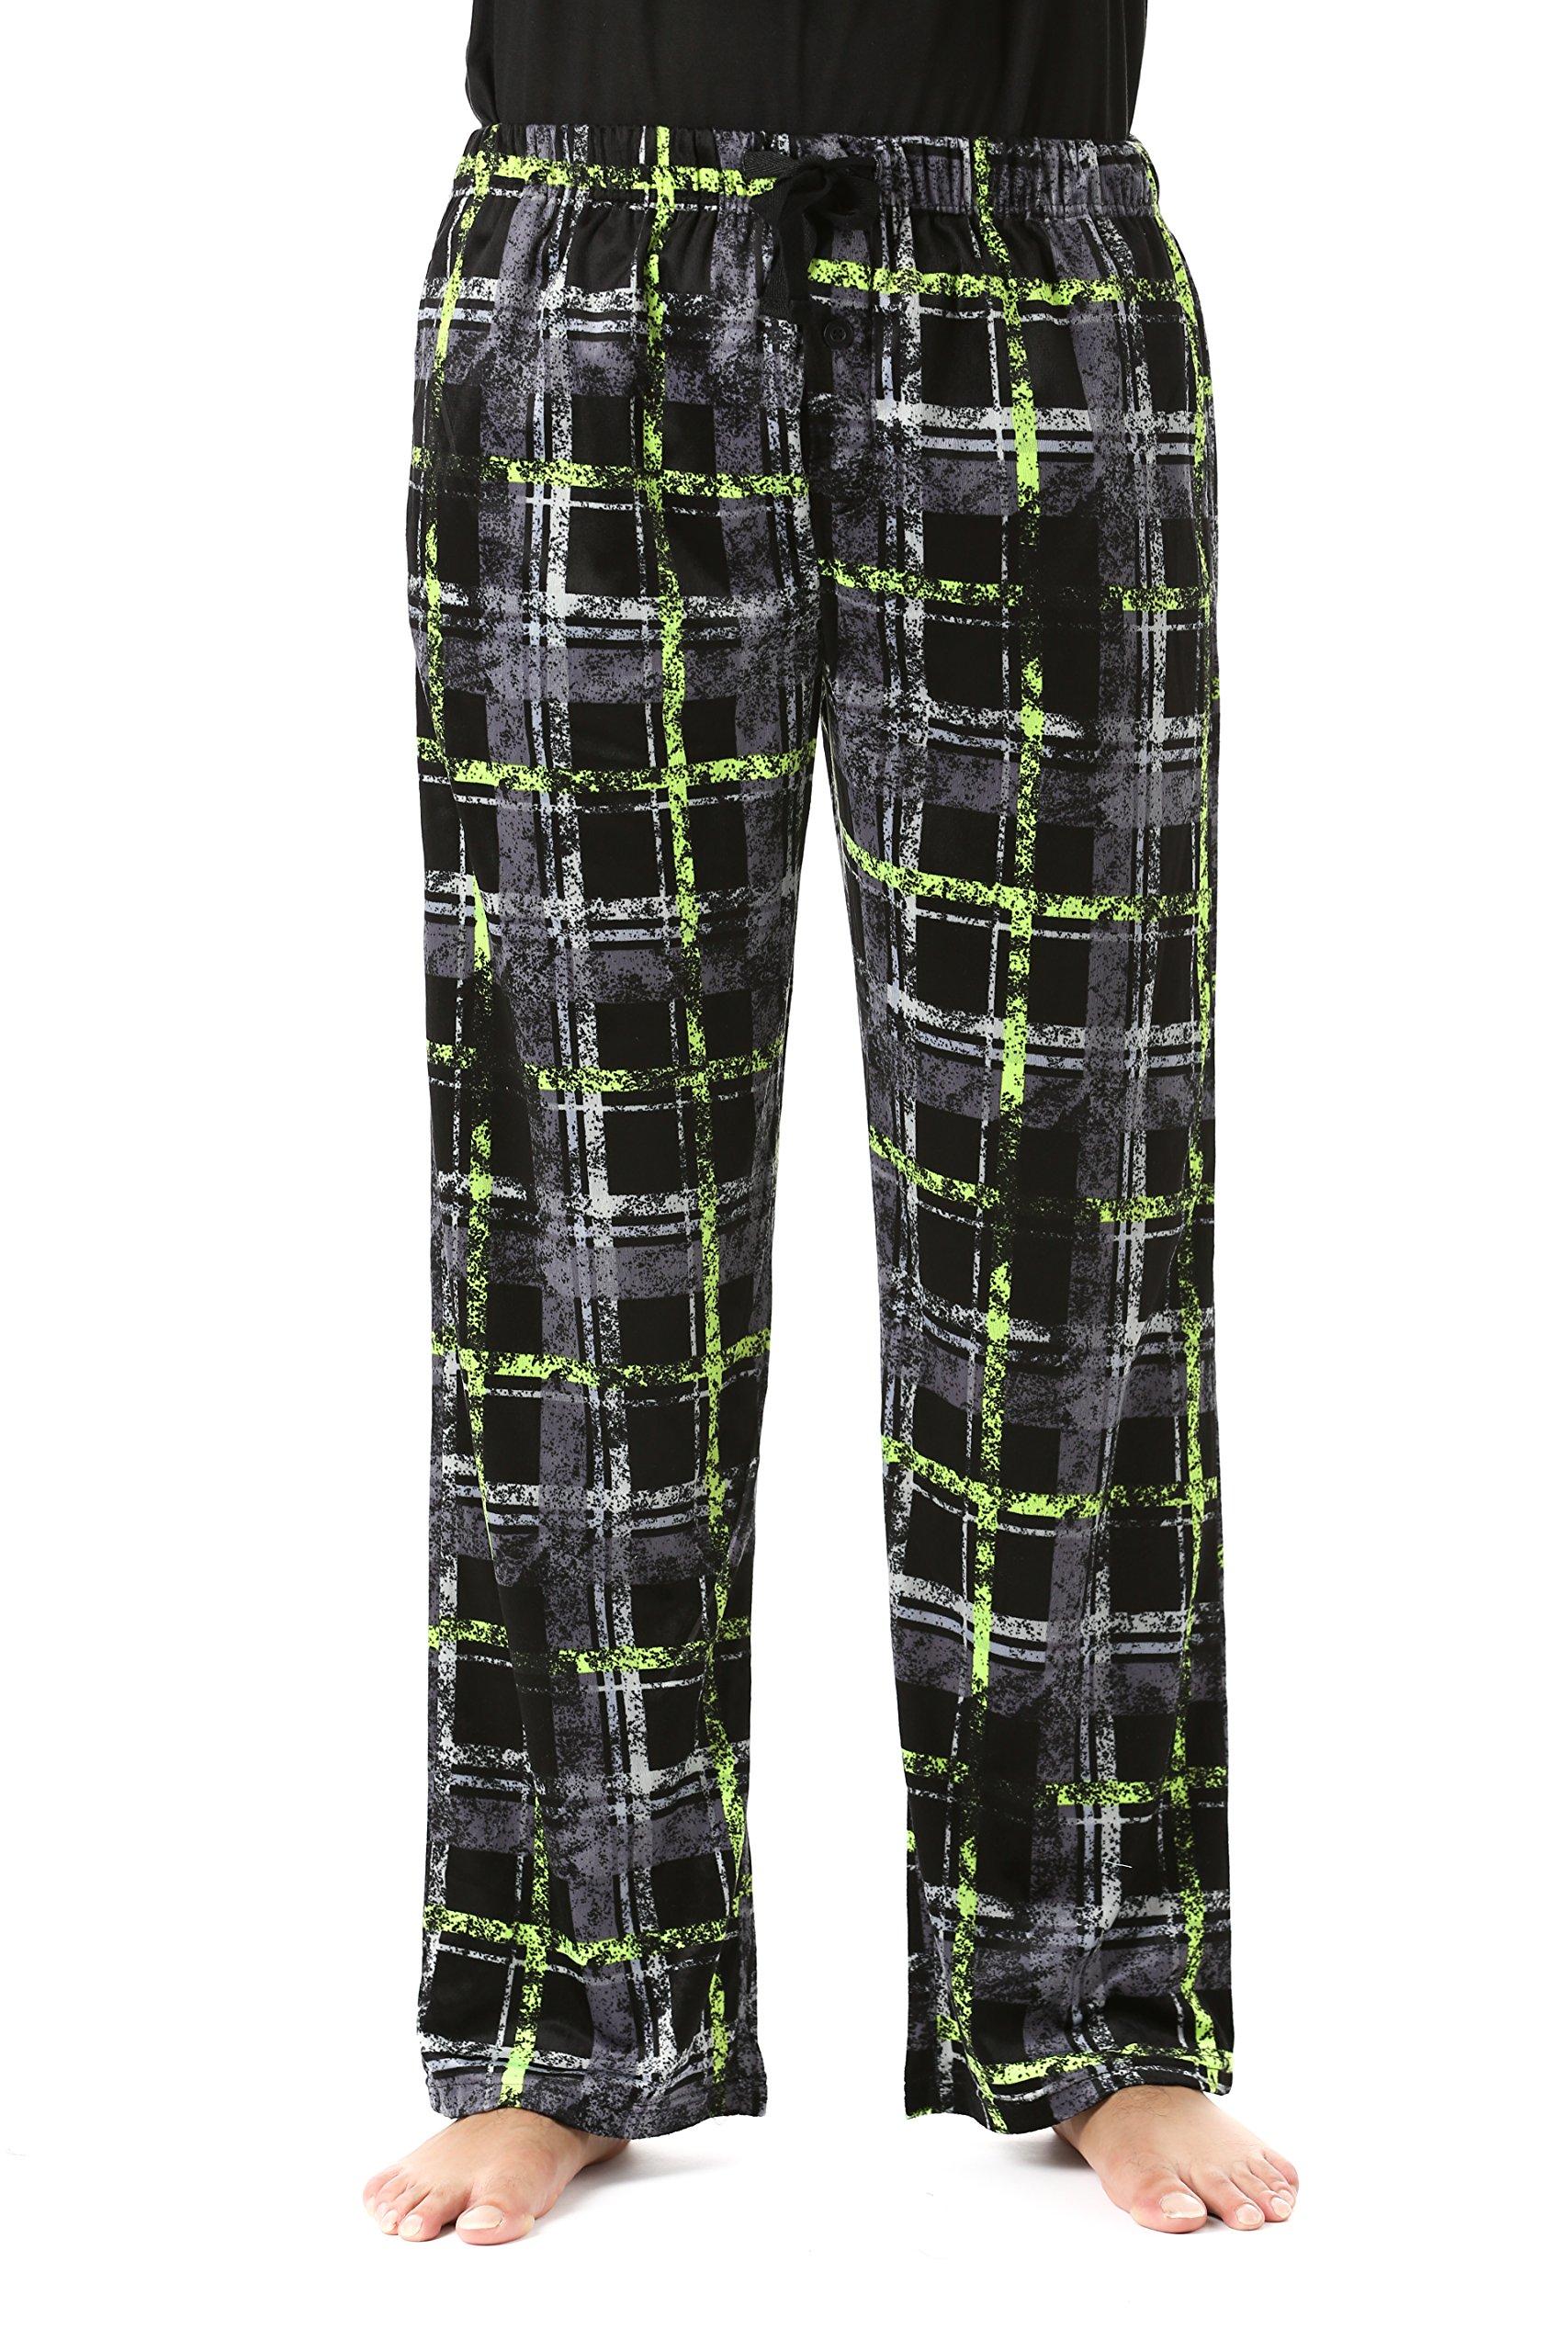 #FollowMe 45903-2C-L Fleece Pajama Pants for Men/Sleepwear/PJs,Plaid 2c,Large by #followme